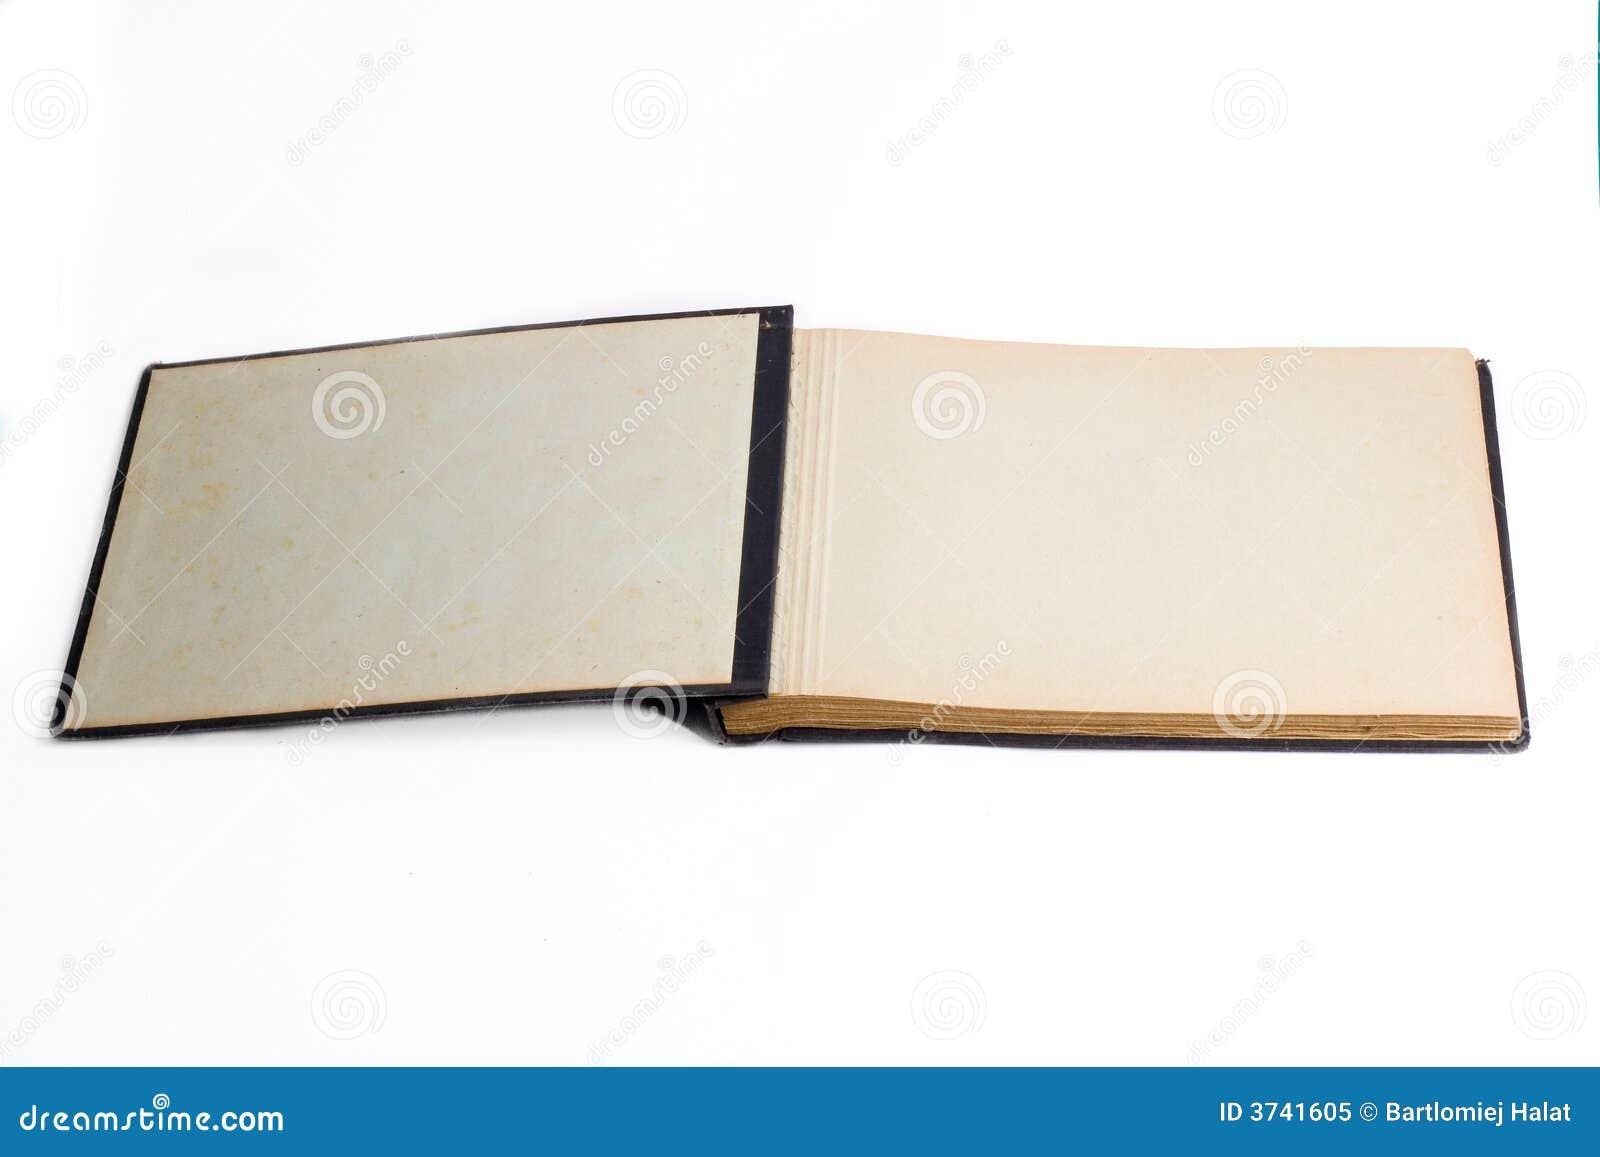 Open Photho : Old Open Book / Photo Album Royalty Free Stock Photo - Image: 3741605